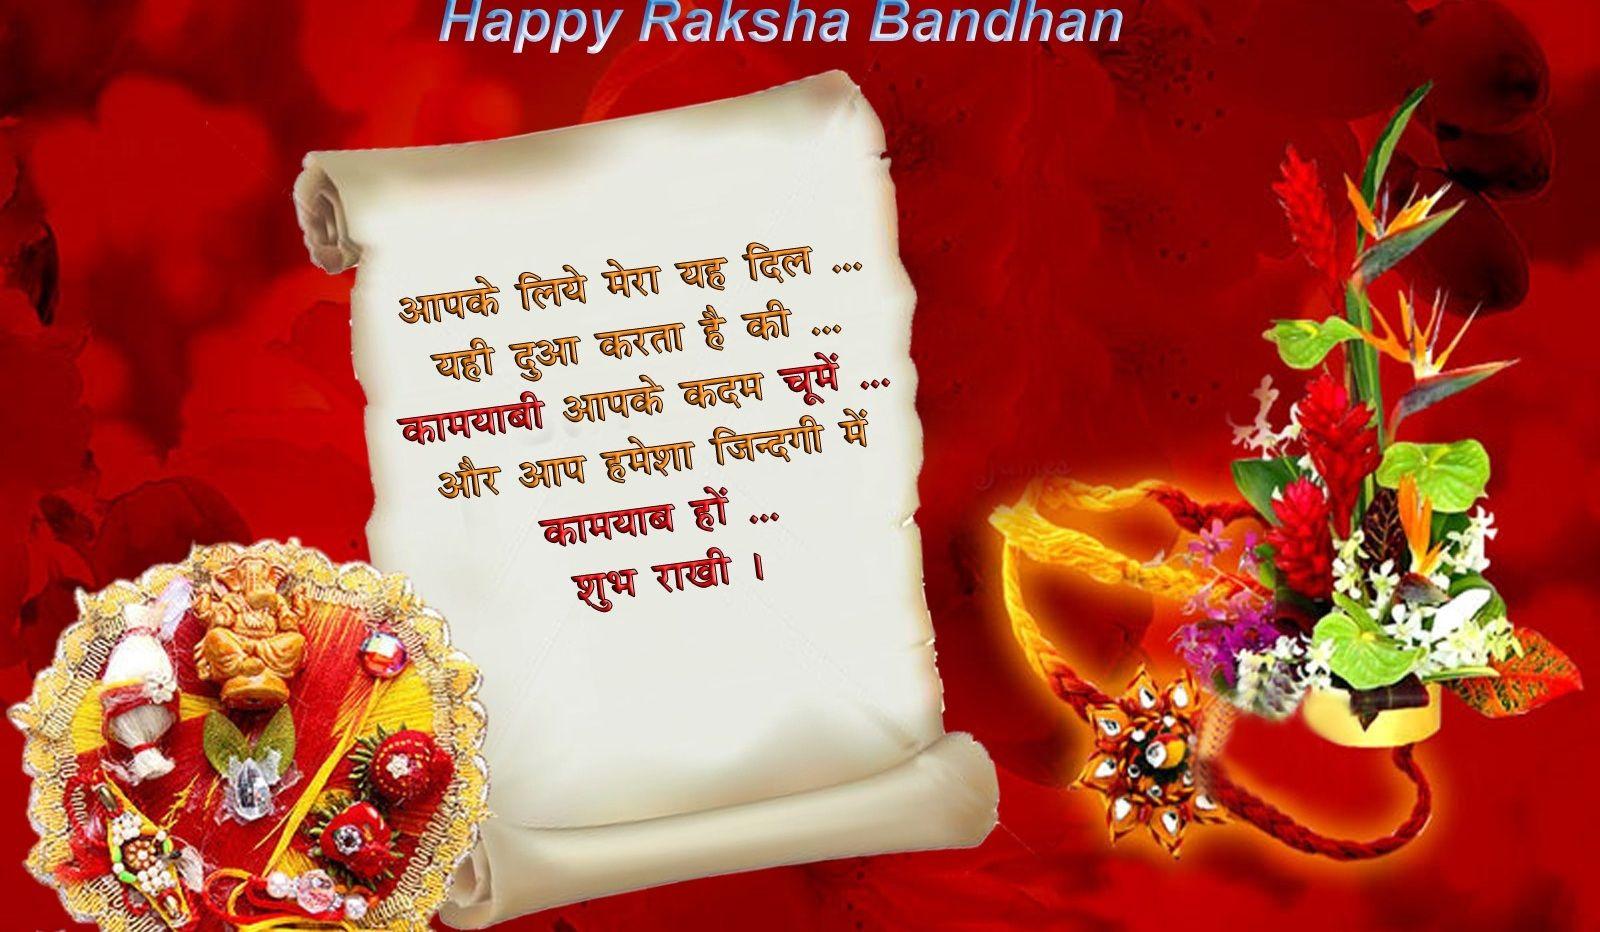 Raksha Bandhan Image Festive Pinterest Raksha Bandhan Quotes